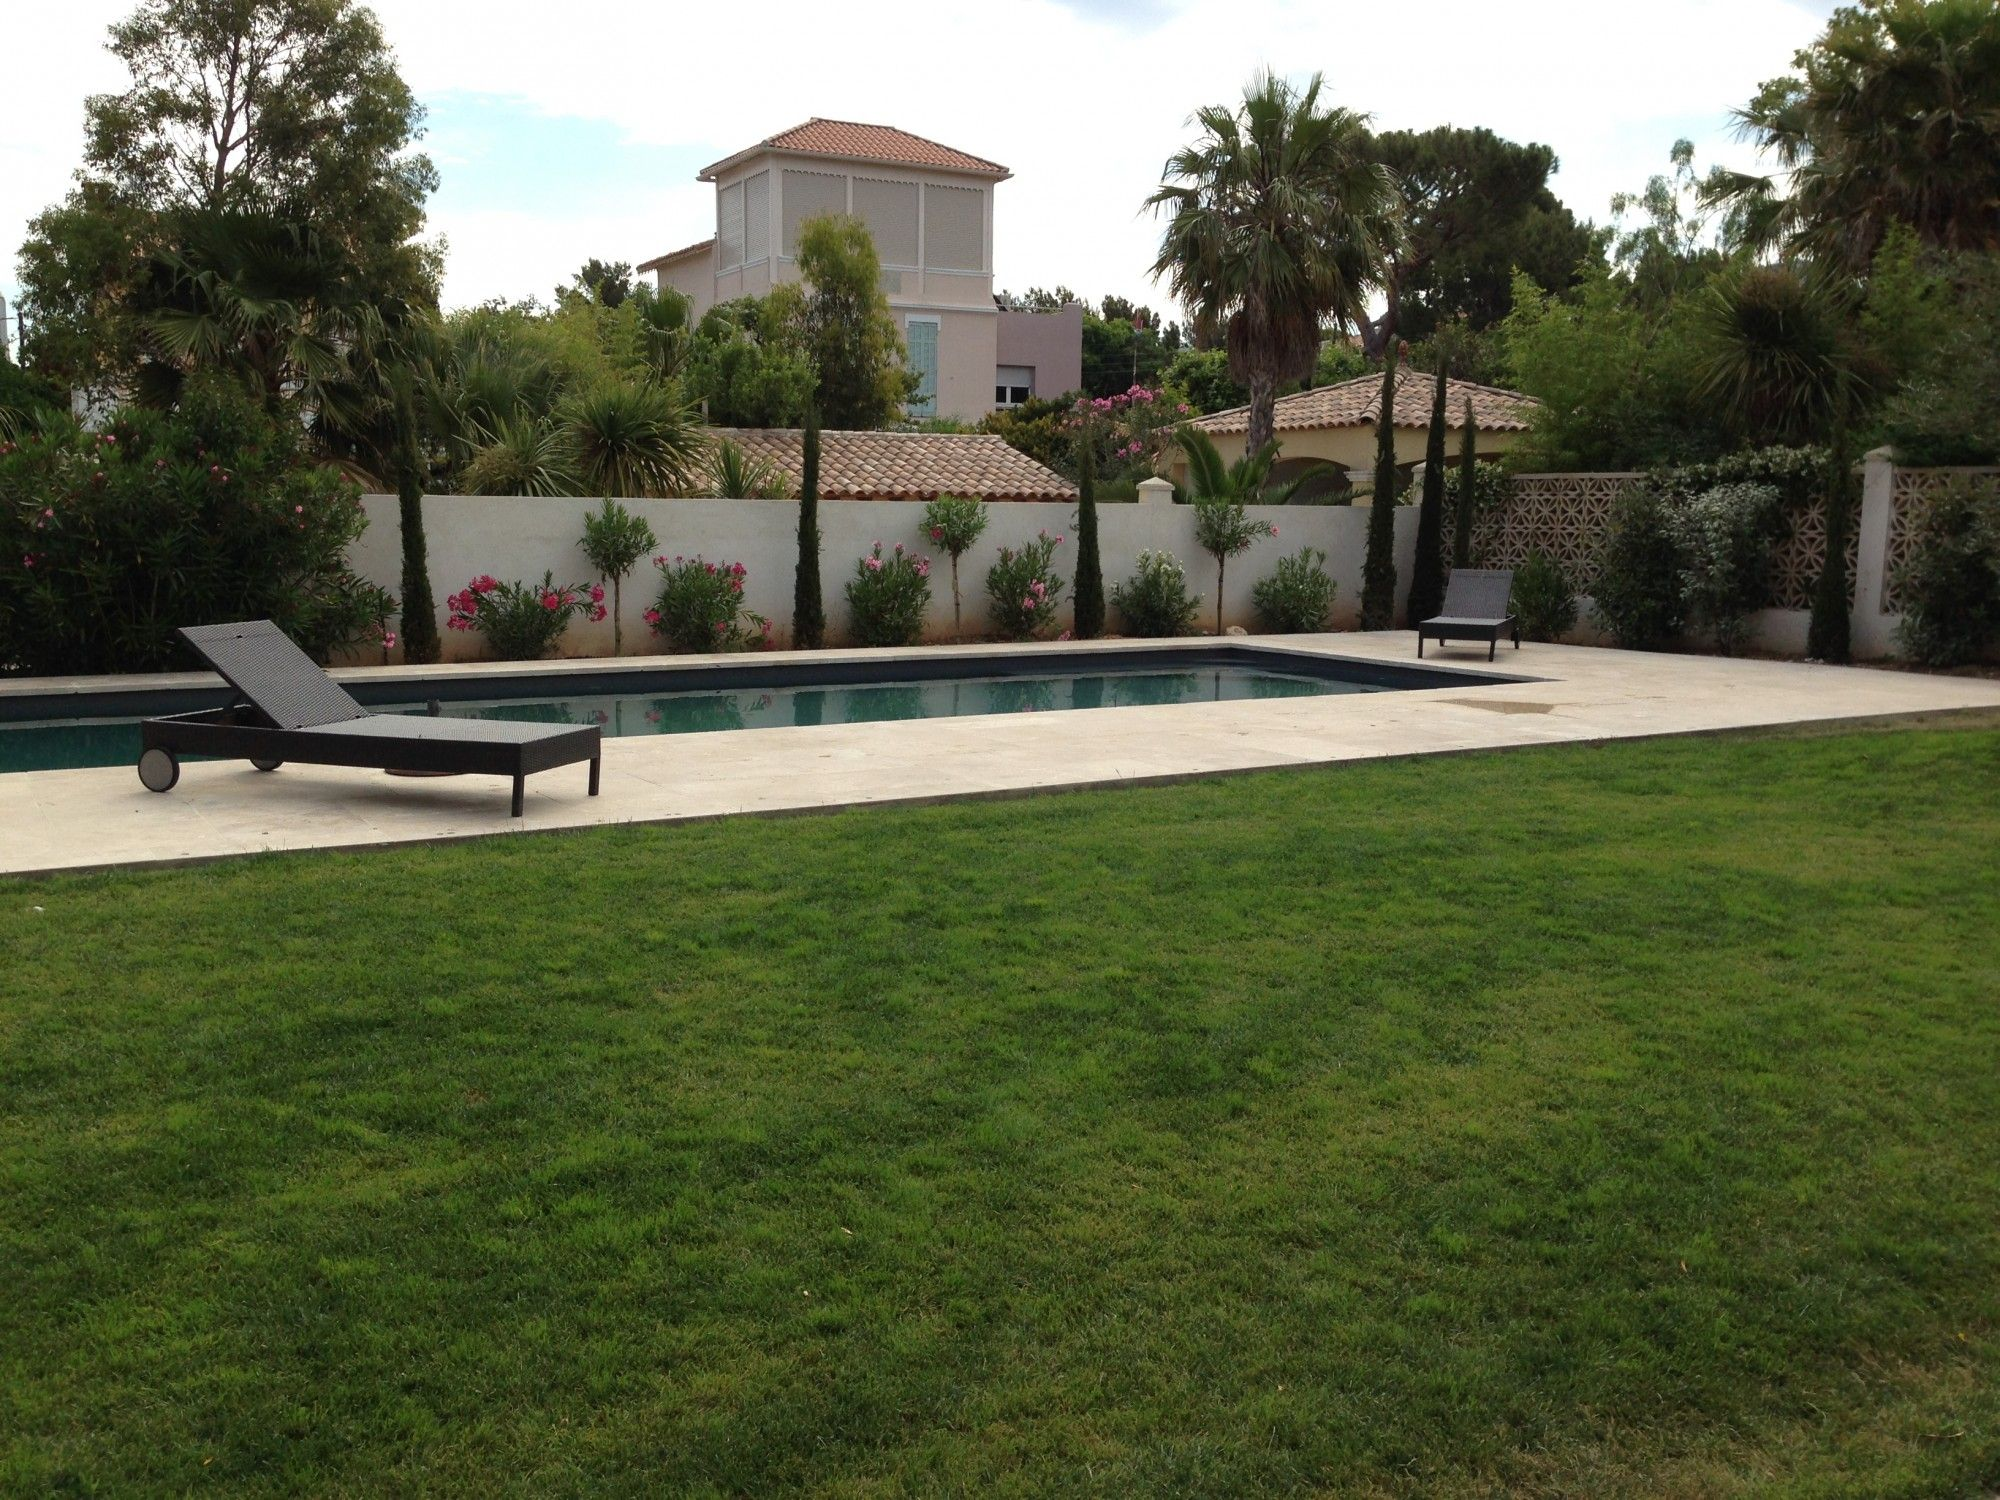 gazon en plaque autour d 39 une piscine vert tige marseille nicolas roubaud jardin pinterest. Black Bedroom Furniture Sets. Home Design Ideas